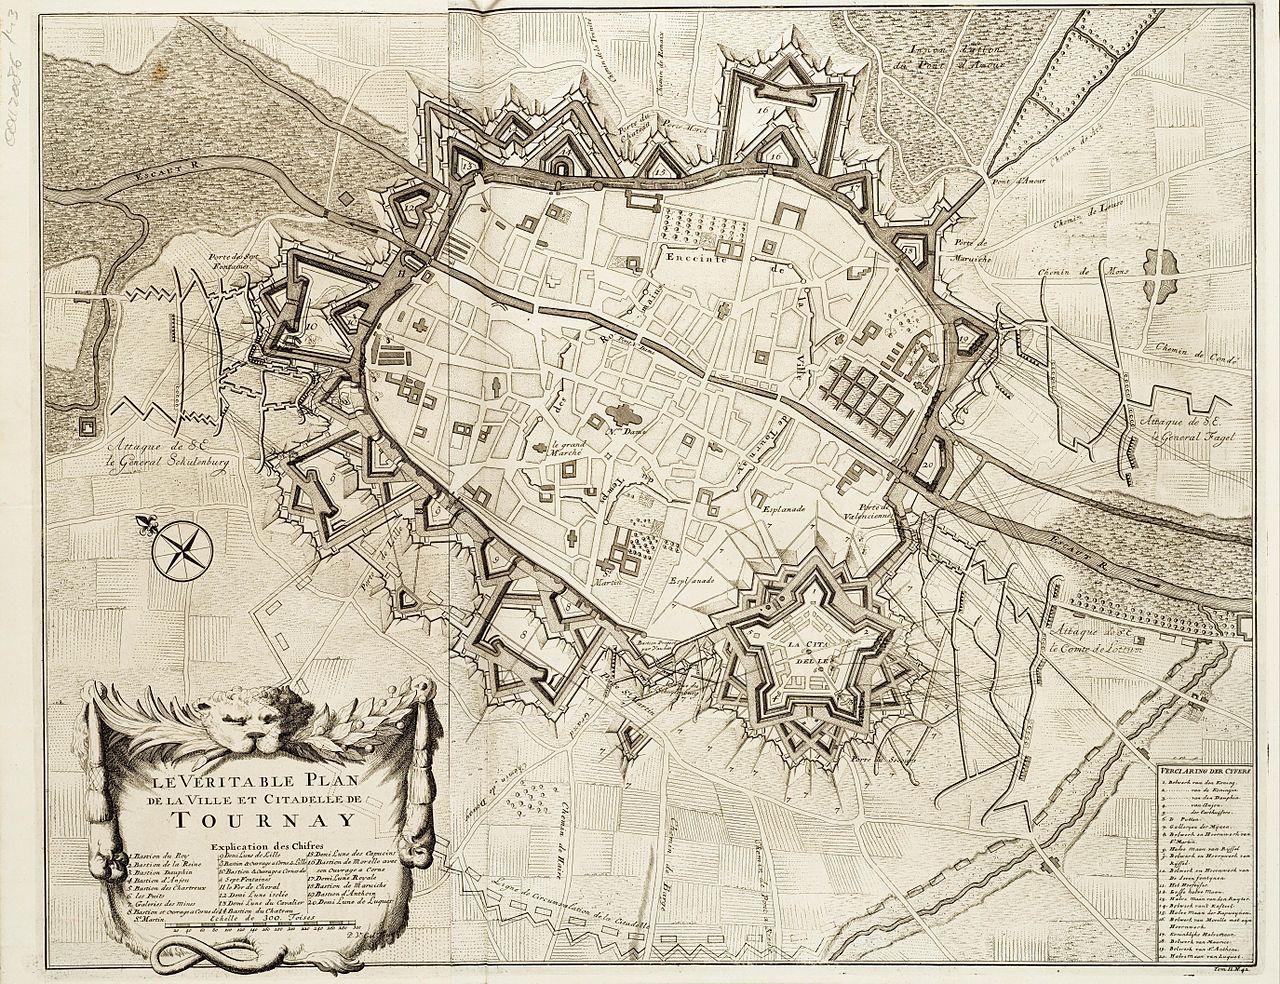 1280px-Siege_of_Tournai_(Doornik)_in_1709_(Isaac_van_der_Kloot).jpg